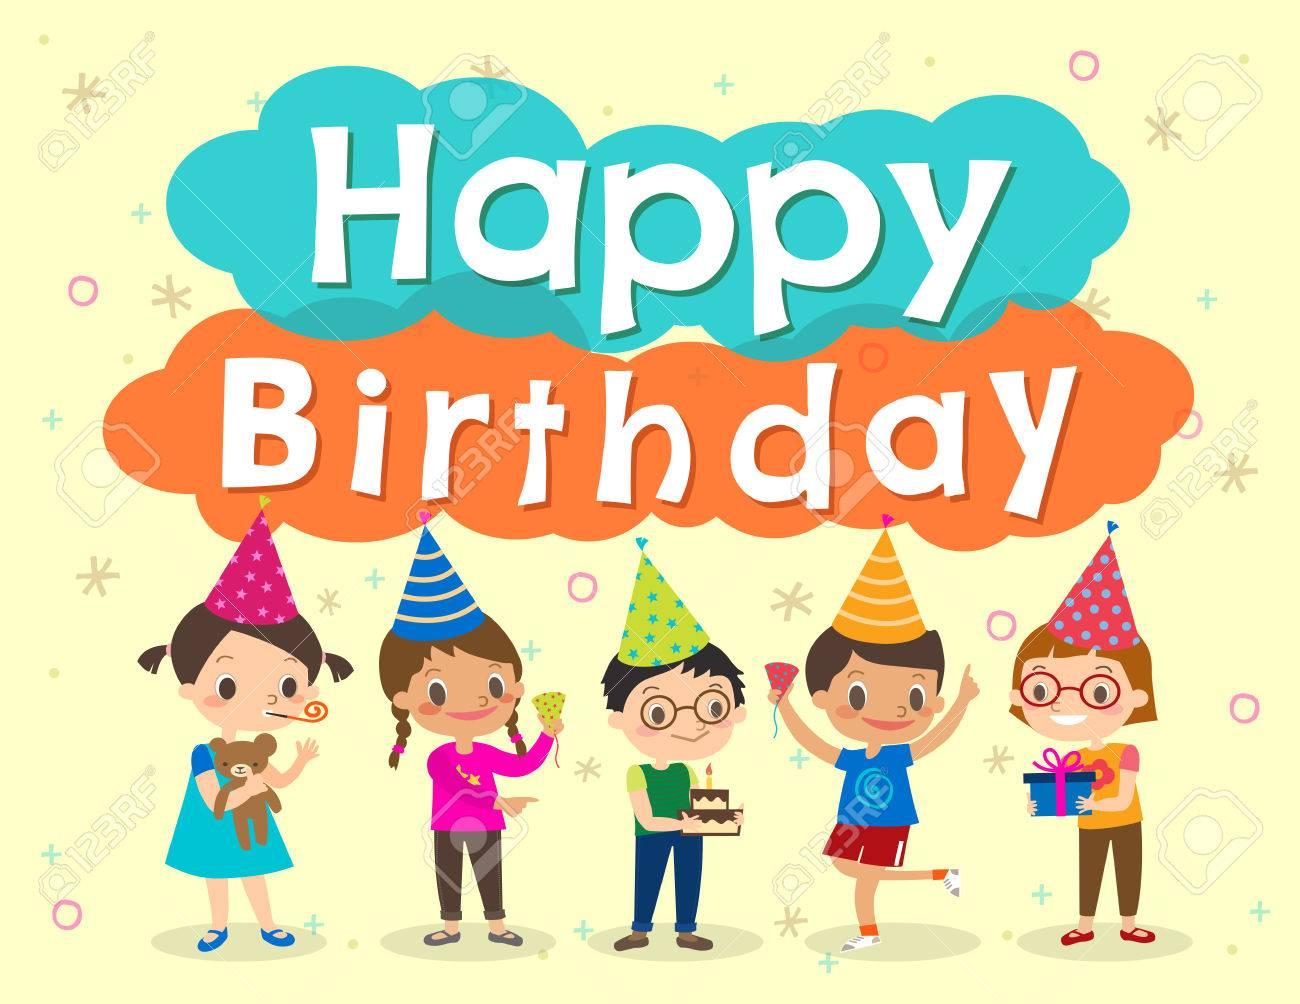 Happy Birthday Party Kids Cartoon Illustration Design Template